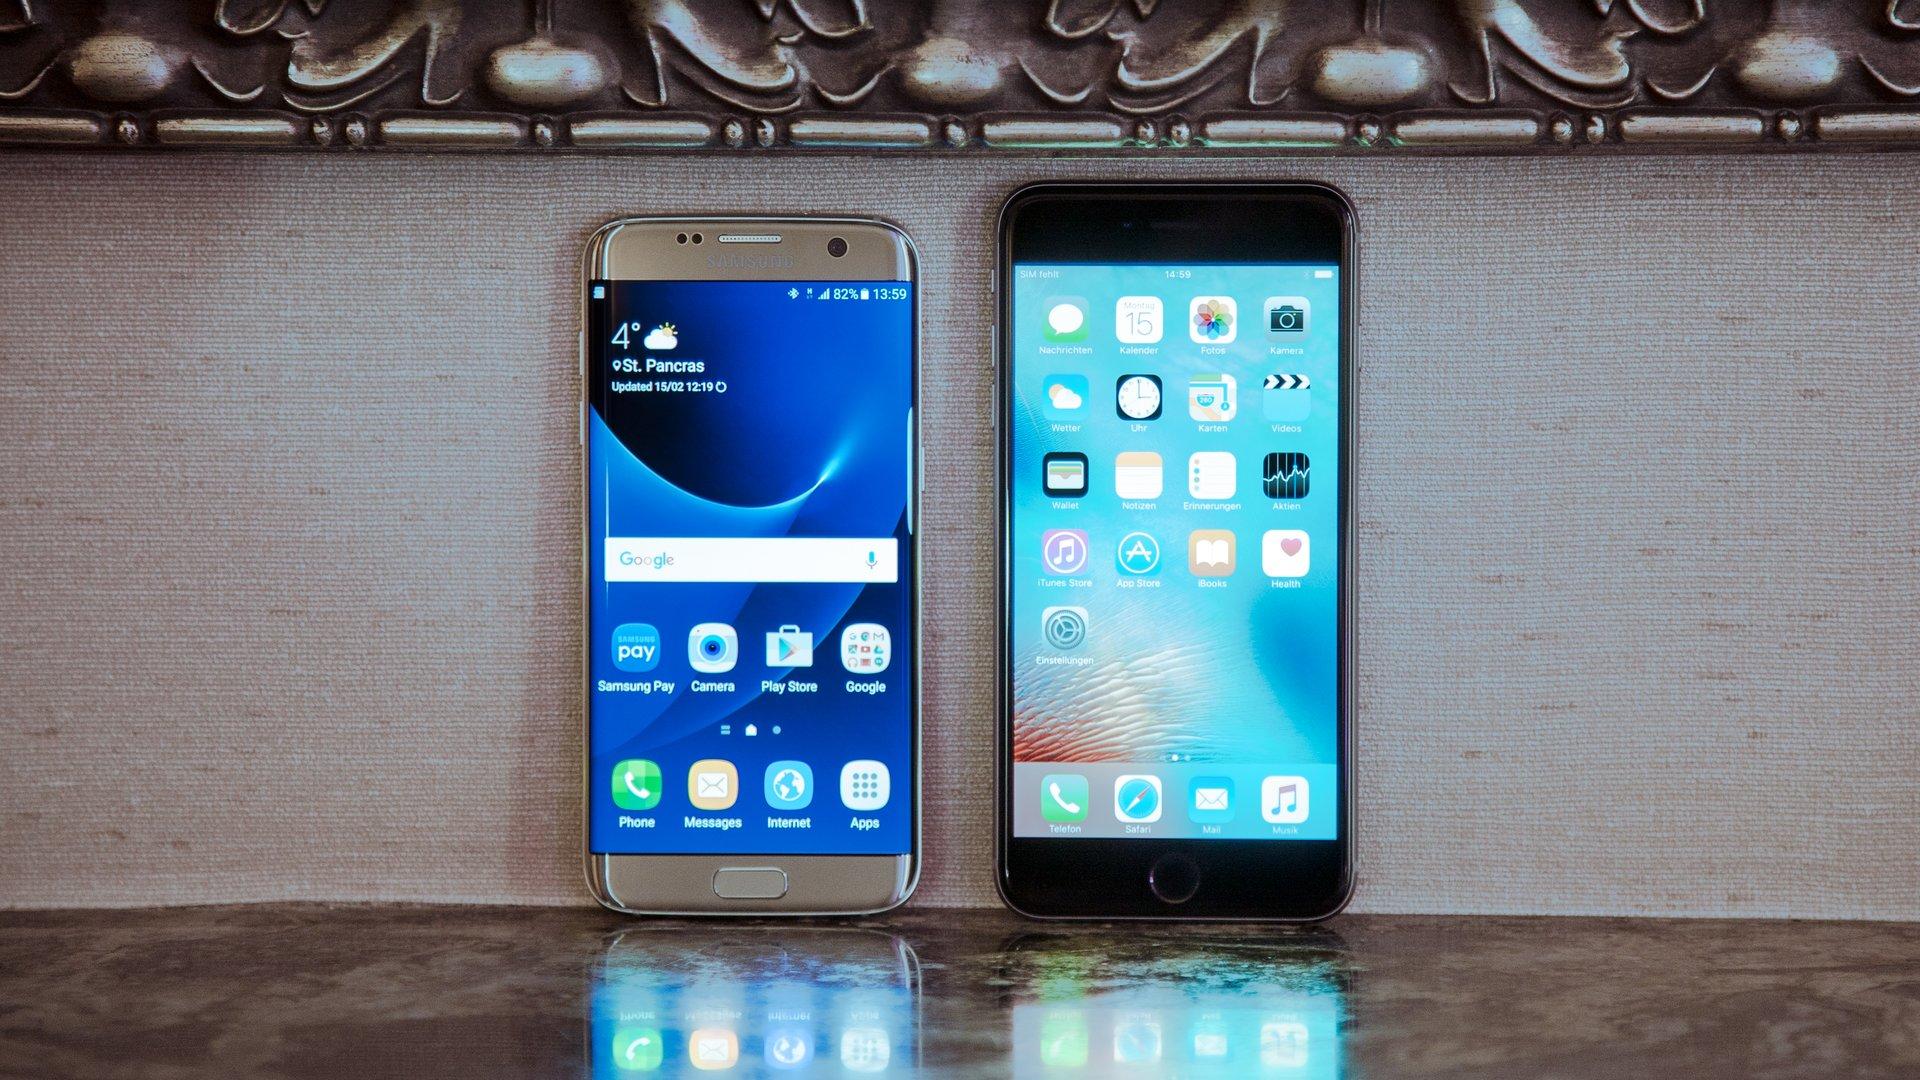 samsung galaxy s7 edge vs galaxy s6 edge premium smartphones im video vergleich giga. Black Bedroom Furniture Sets. Home Design Ideas